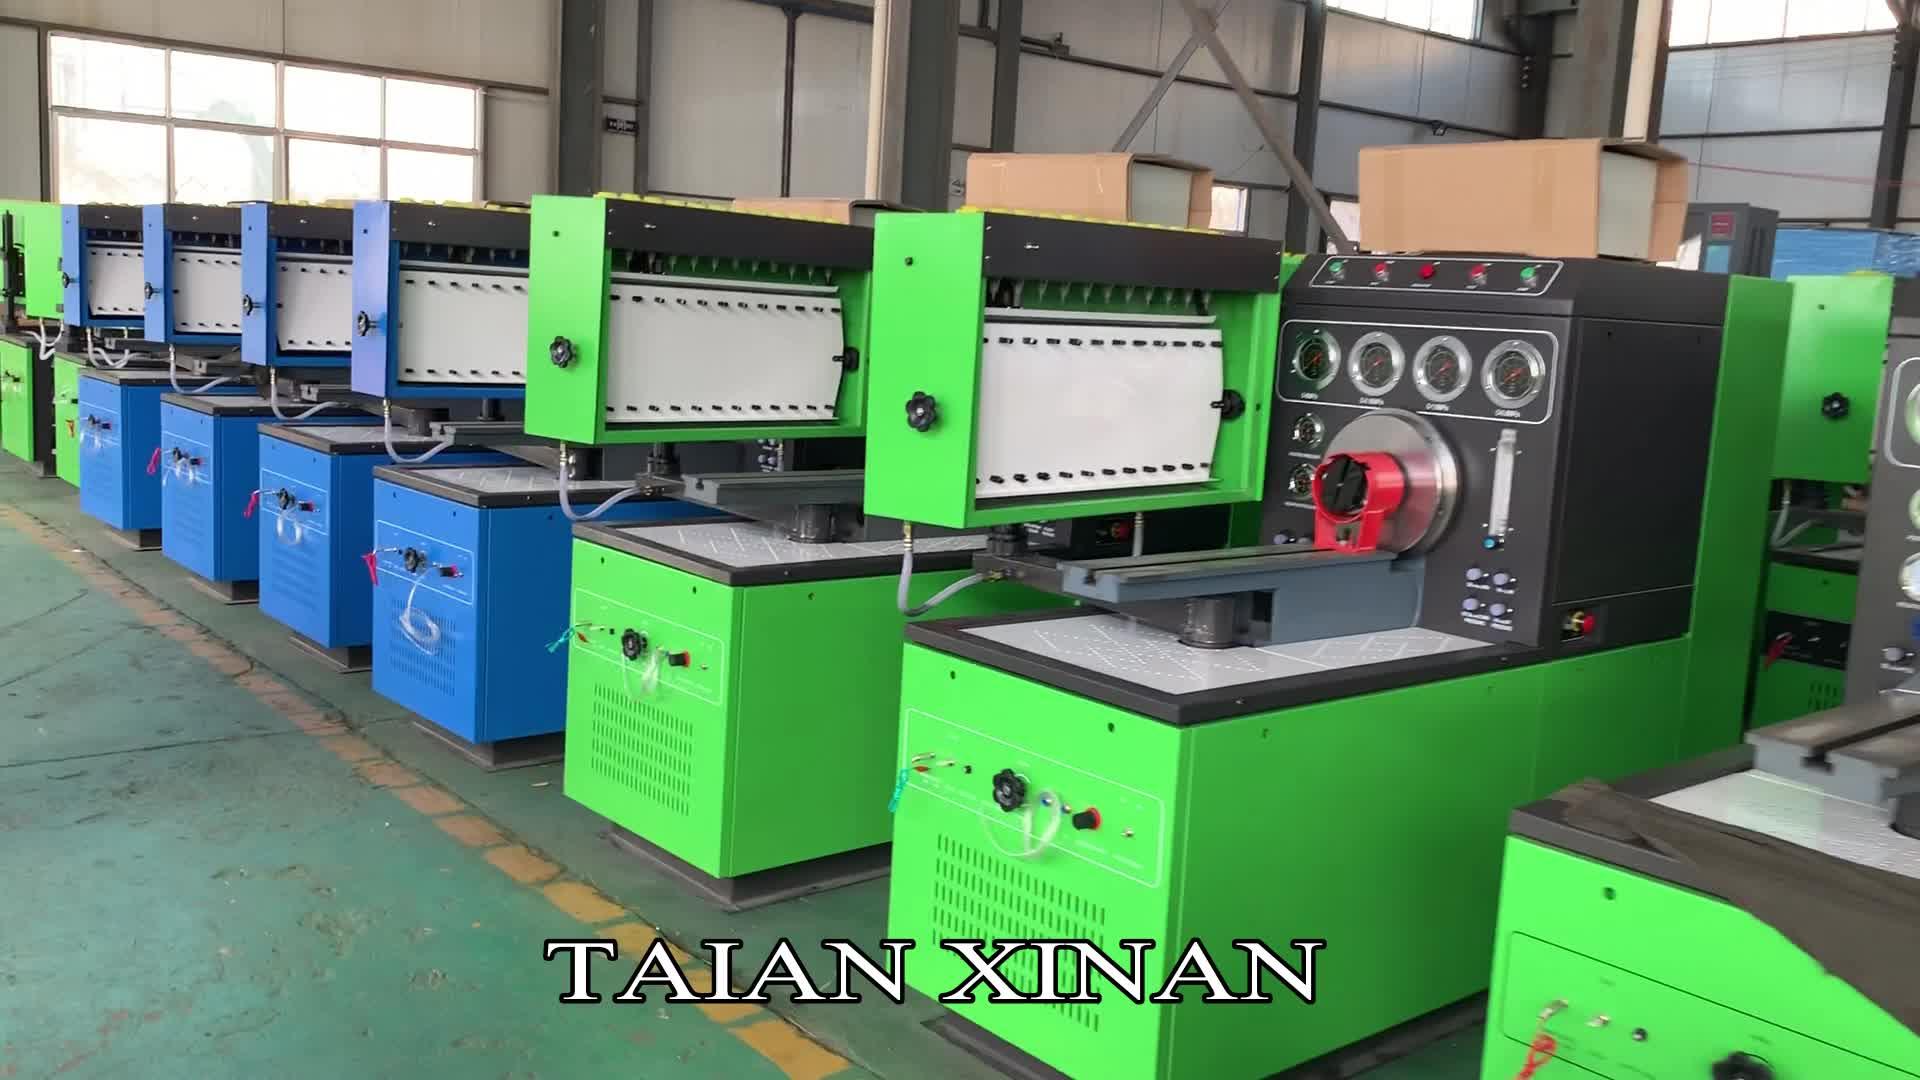 XINAN ดีเซลปั๊ม flow meter test bench ดีเซลการใช้ฉีดปั๊ม efe 515 12 กระบอก 12PSDW